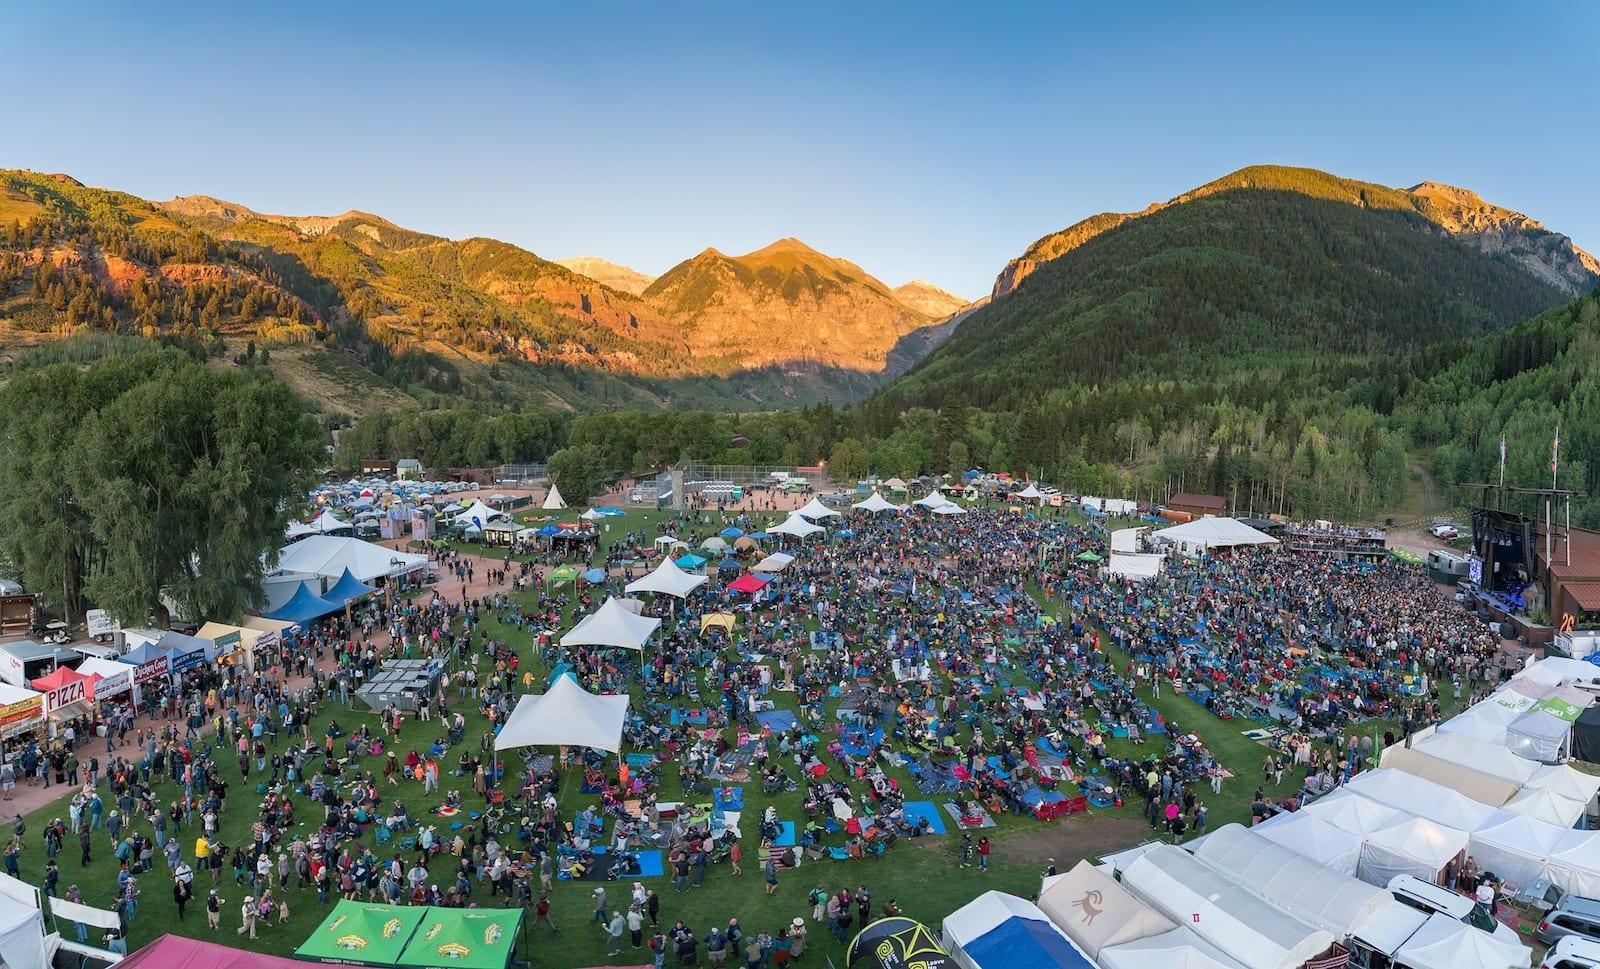 Telluride Town Park Stage, Telluride, Colorado